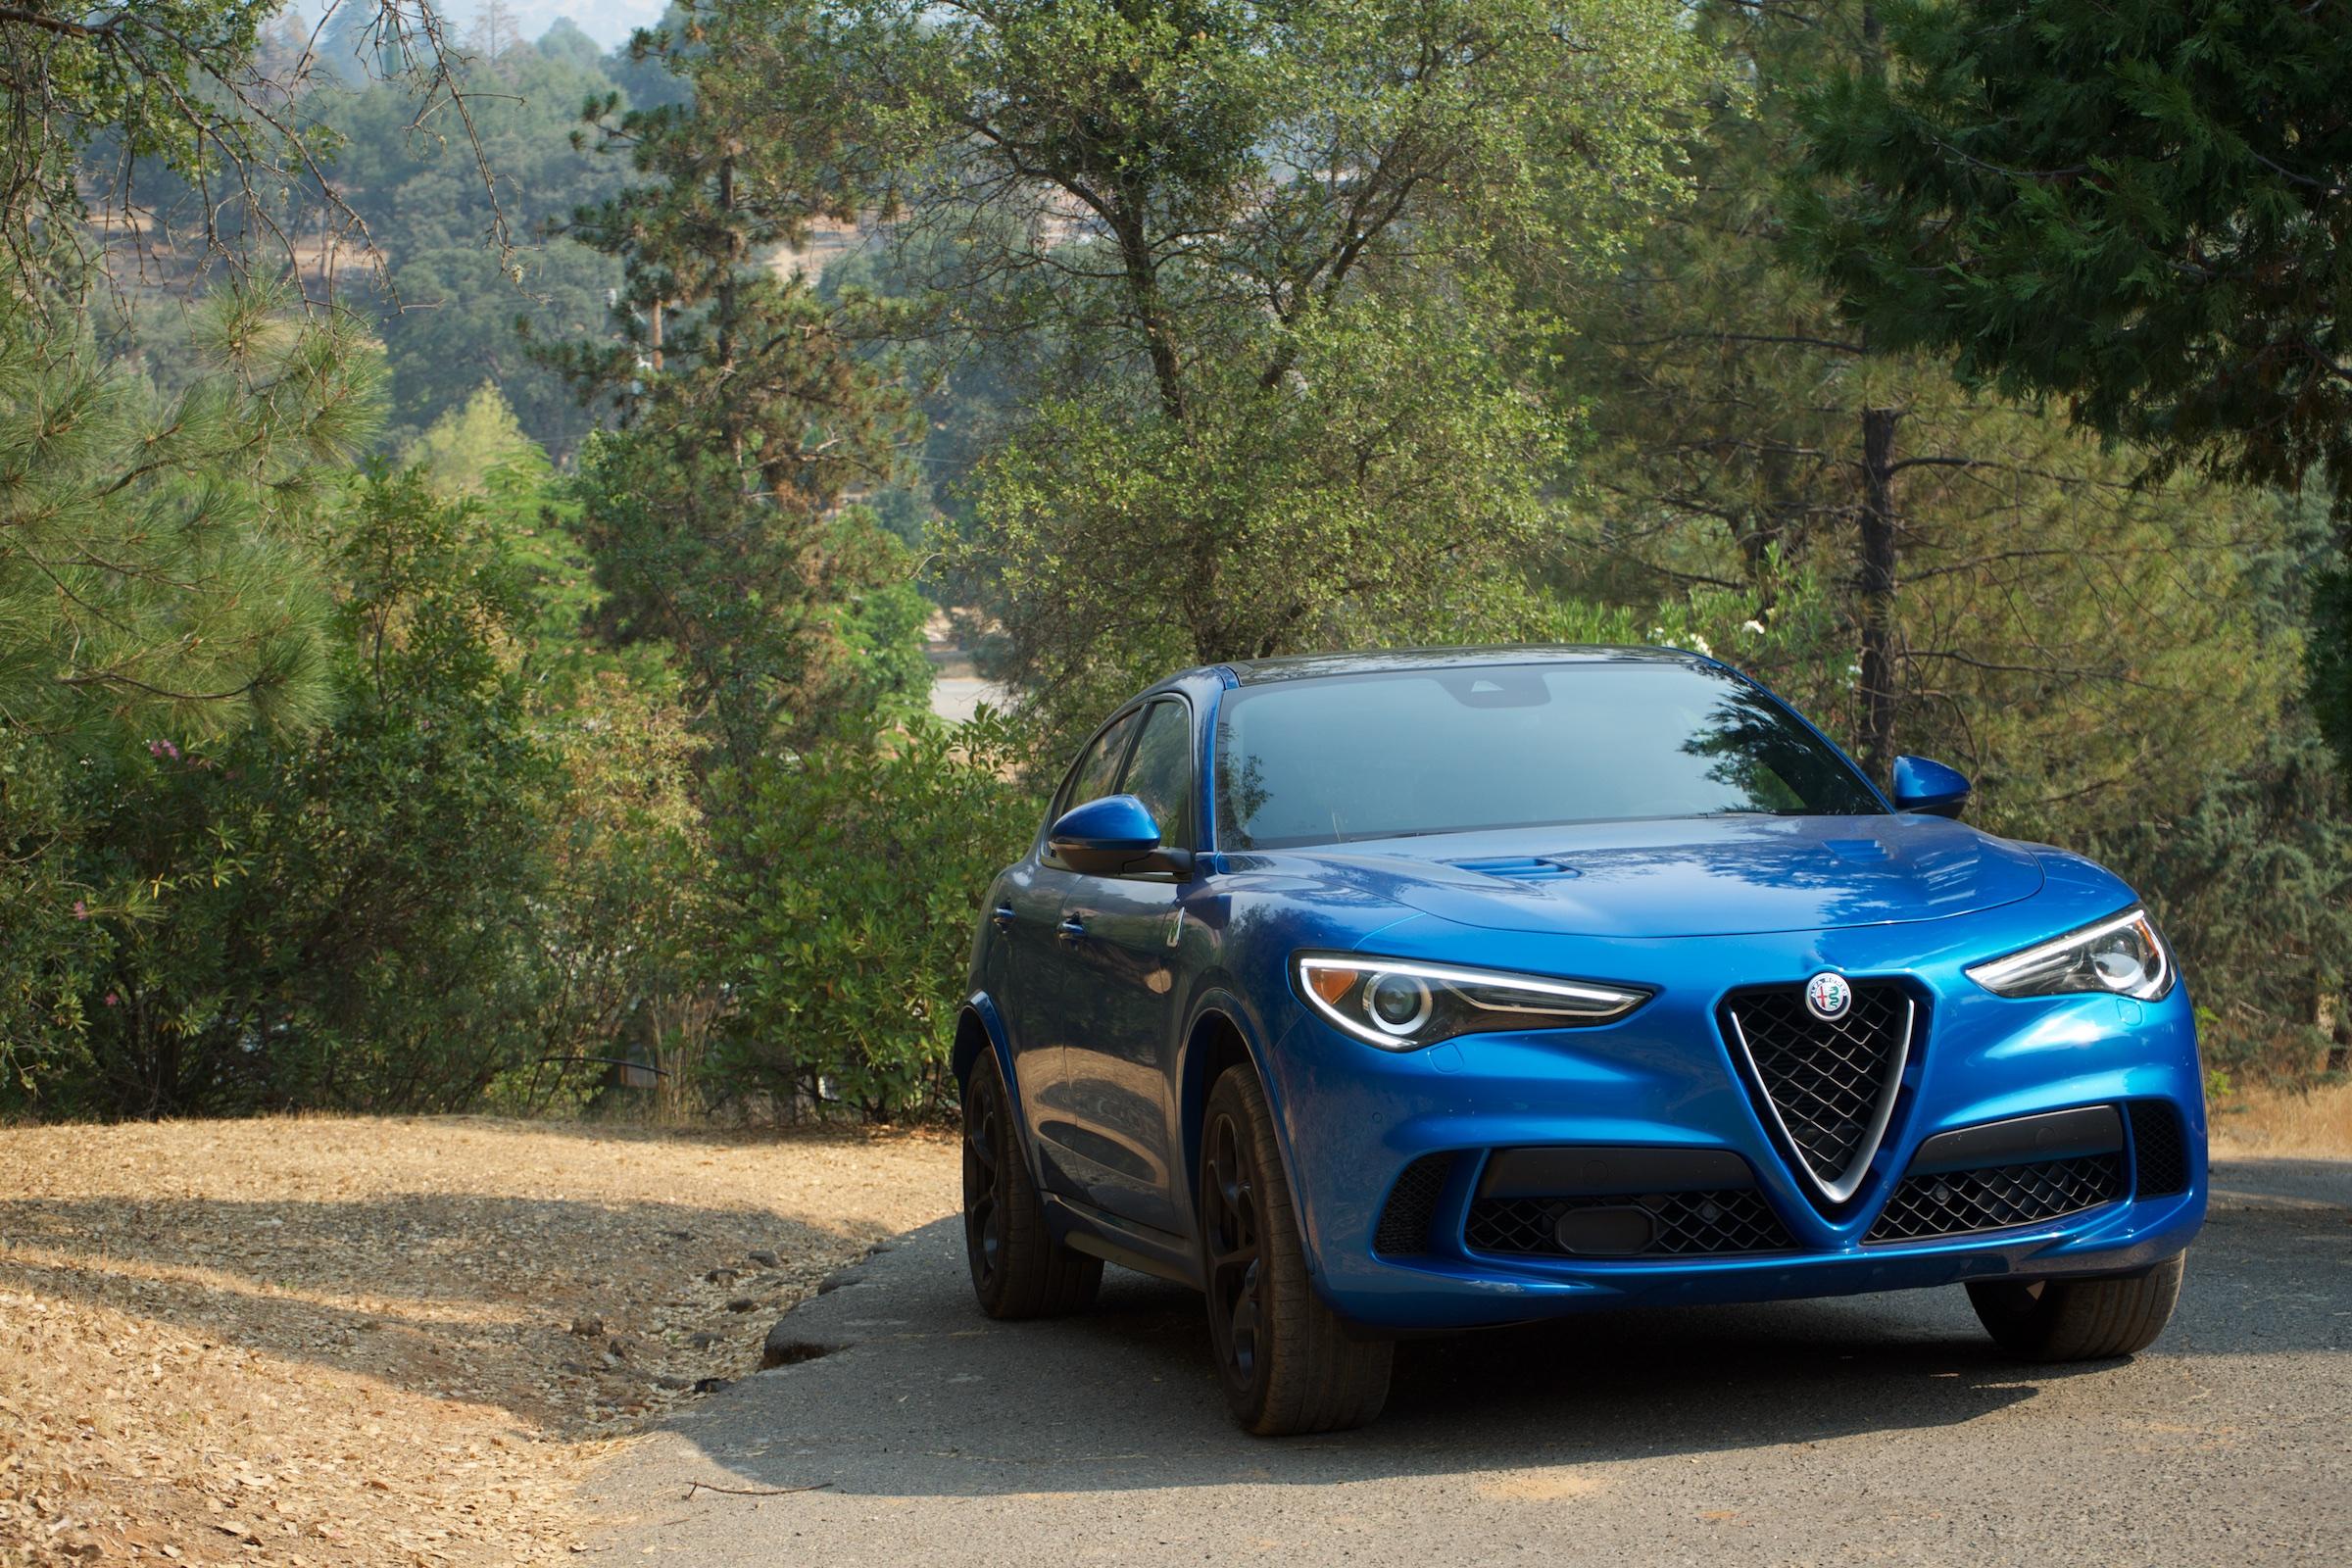 1 160 Miles In 11 Days A Grand Tour With The Alfa Romeo Stelvio